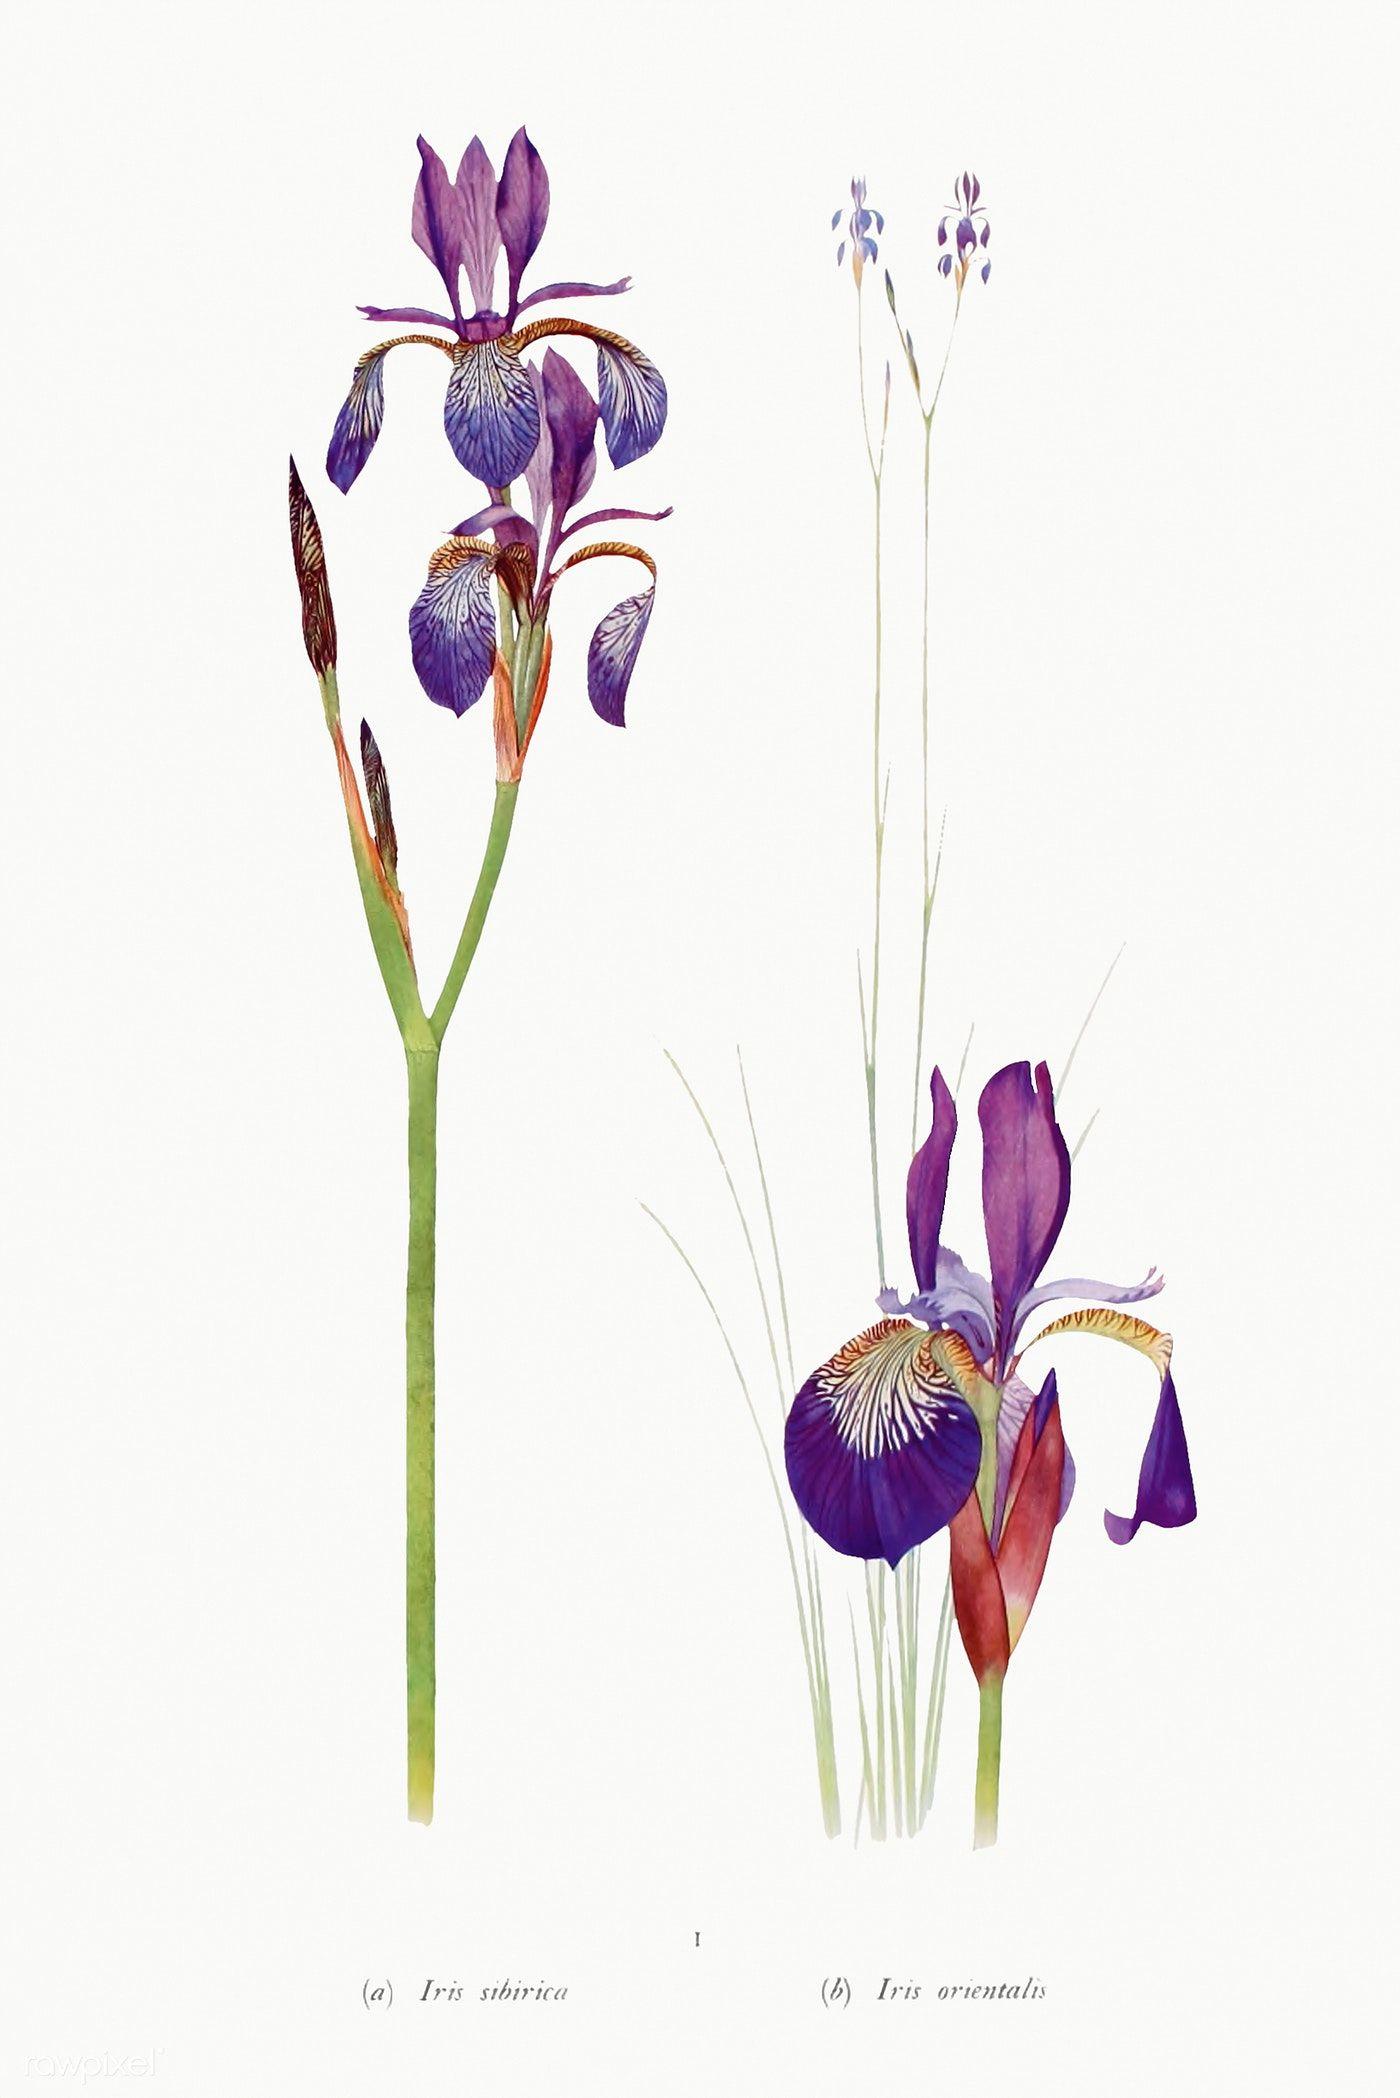 Download Premium Illustration Of Vintage Iris Flower Illustration Template In 2020 Flower Illustration Iris Flowers Illustration